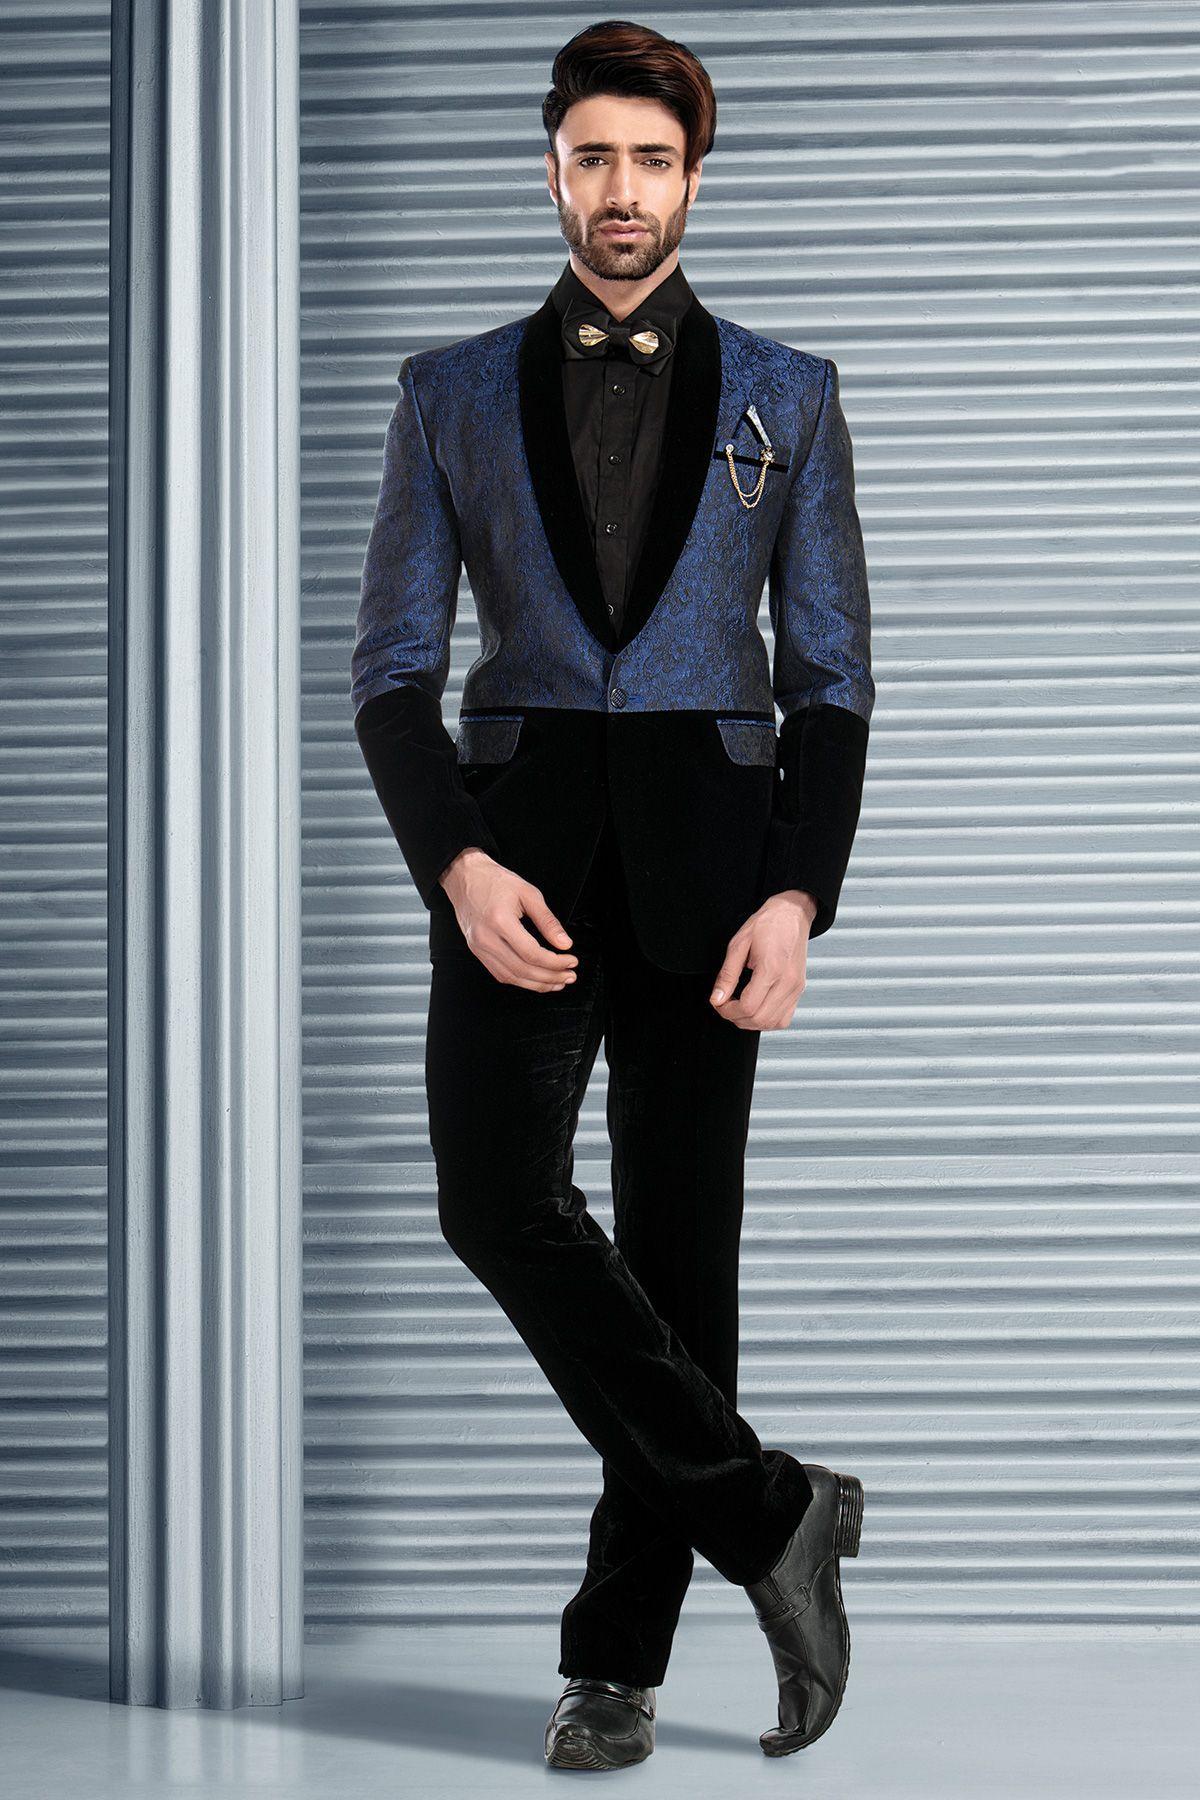 Blue Brocade Tuxedo Suit-ST604 | TUXEDO SUITS | Pinterest | Buy ...